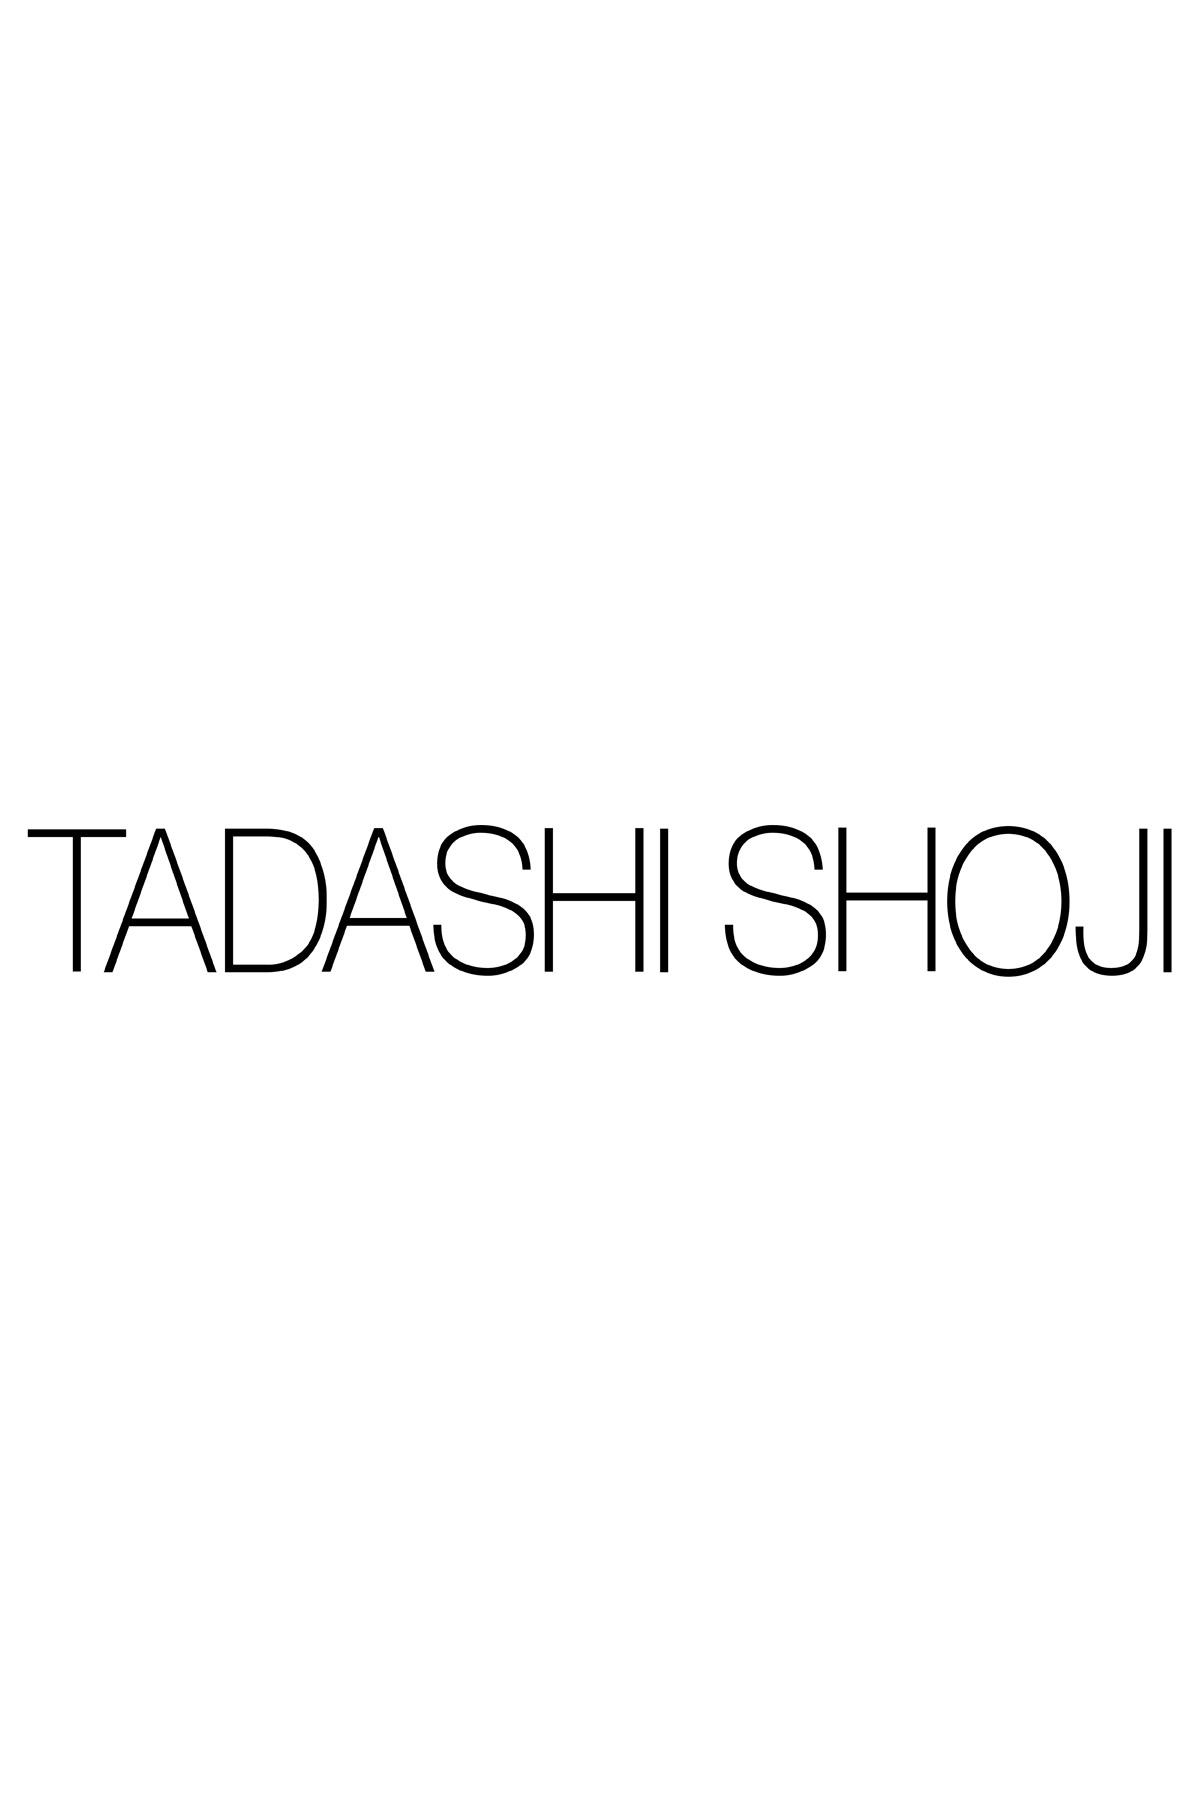 Tadashi Shoji - Samar Floral Embroidered Lace Dress - PLUS SIZE